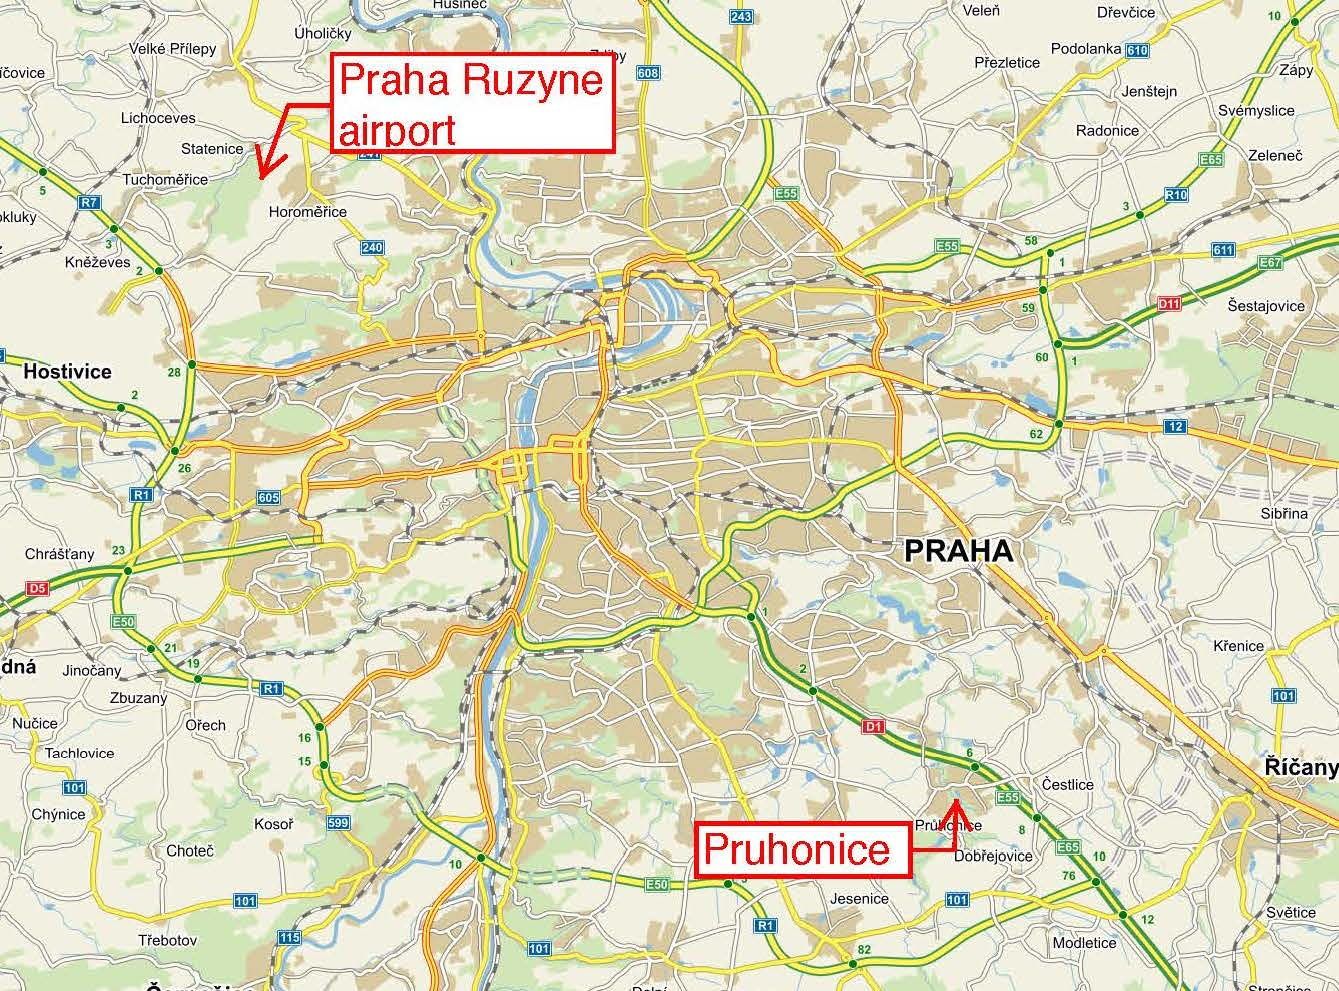 Regiojet Prague Vclav Havel Airport